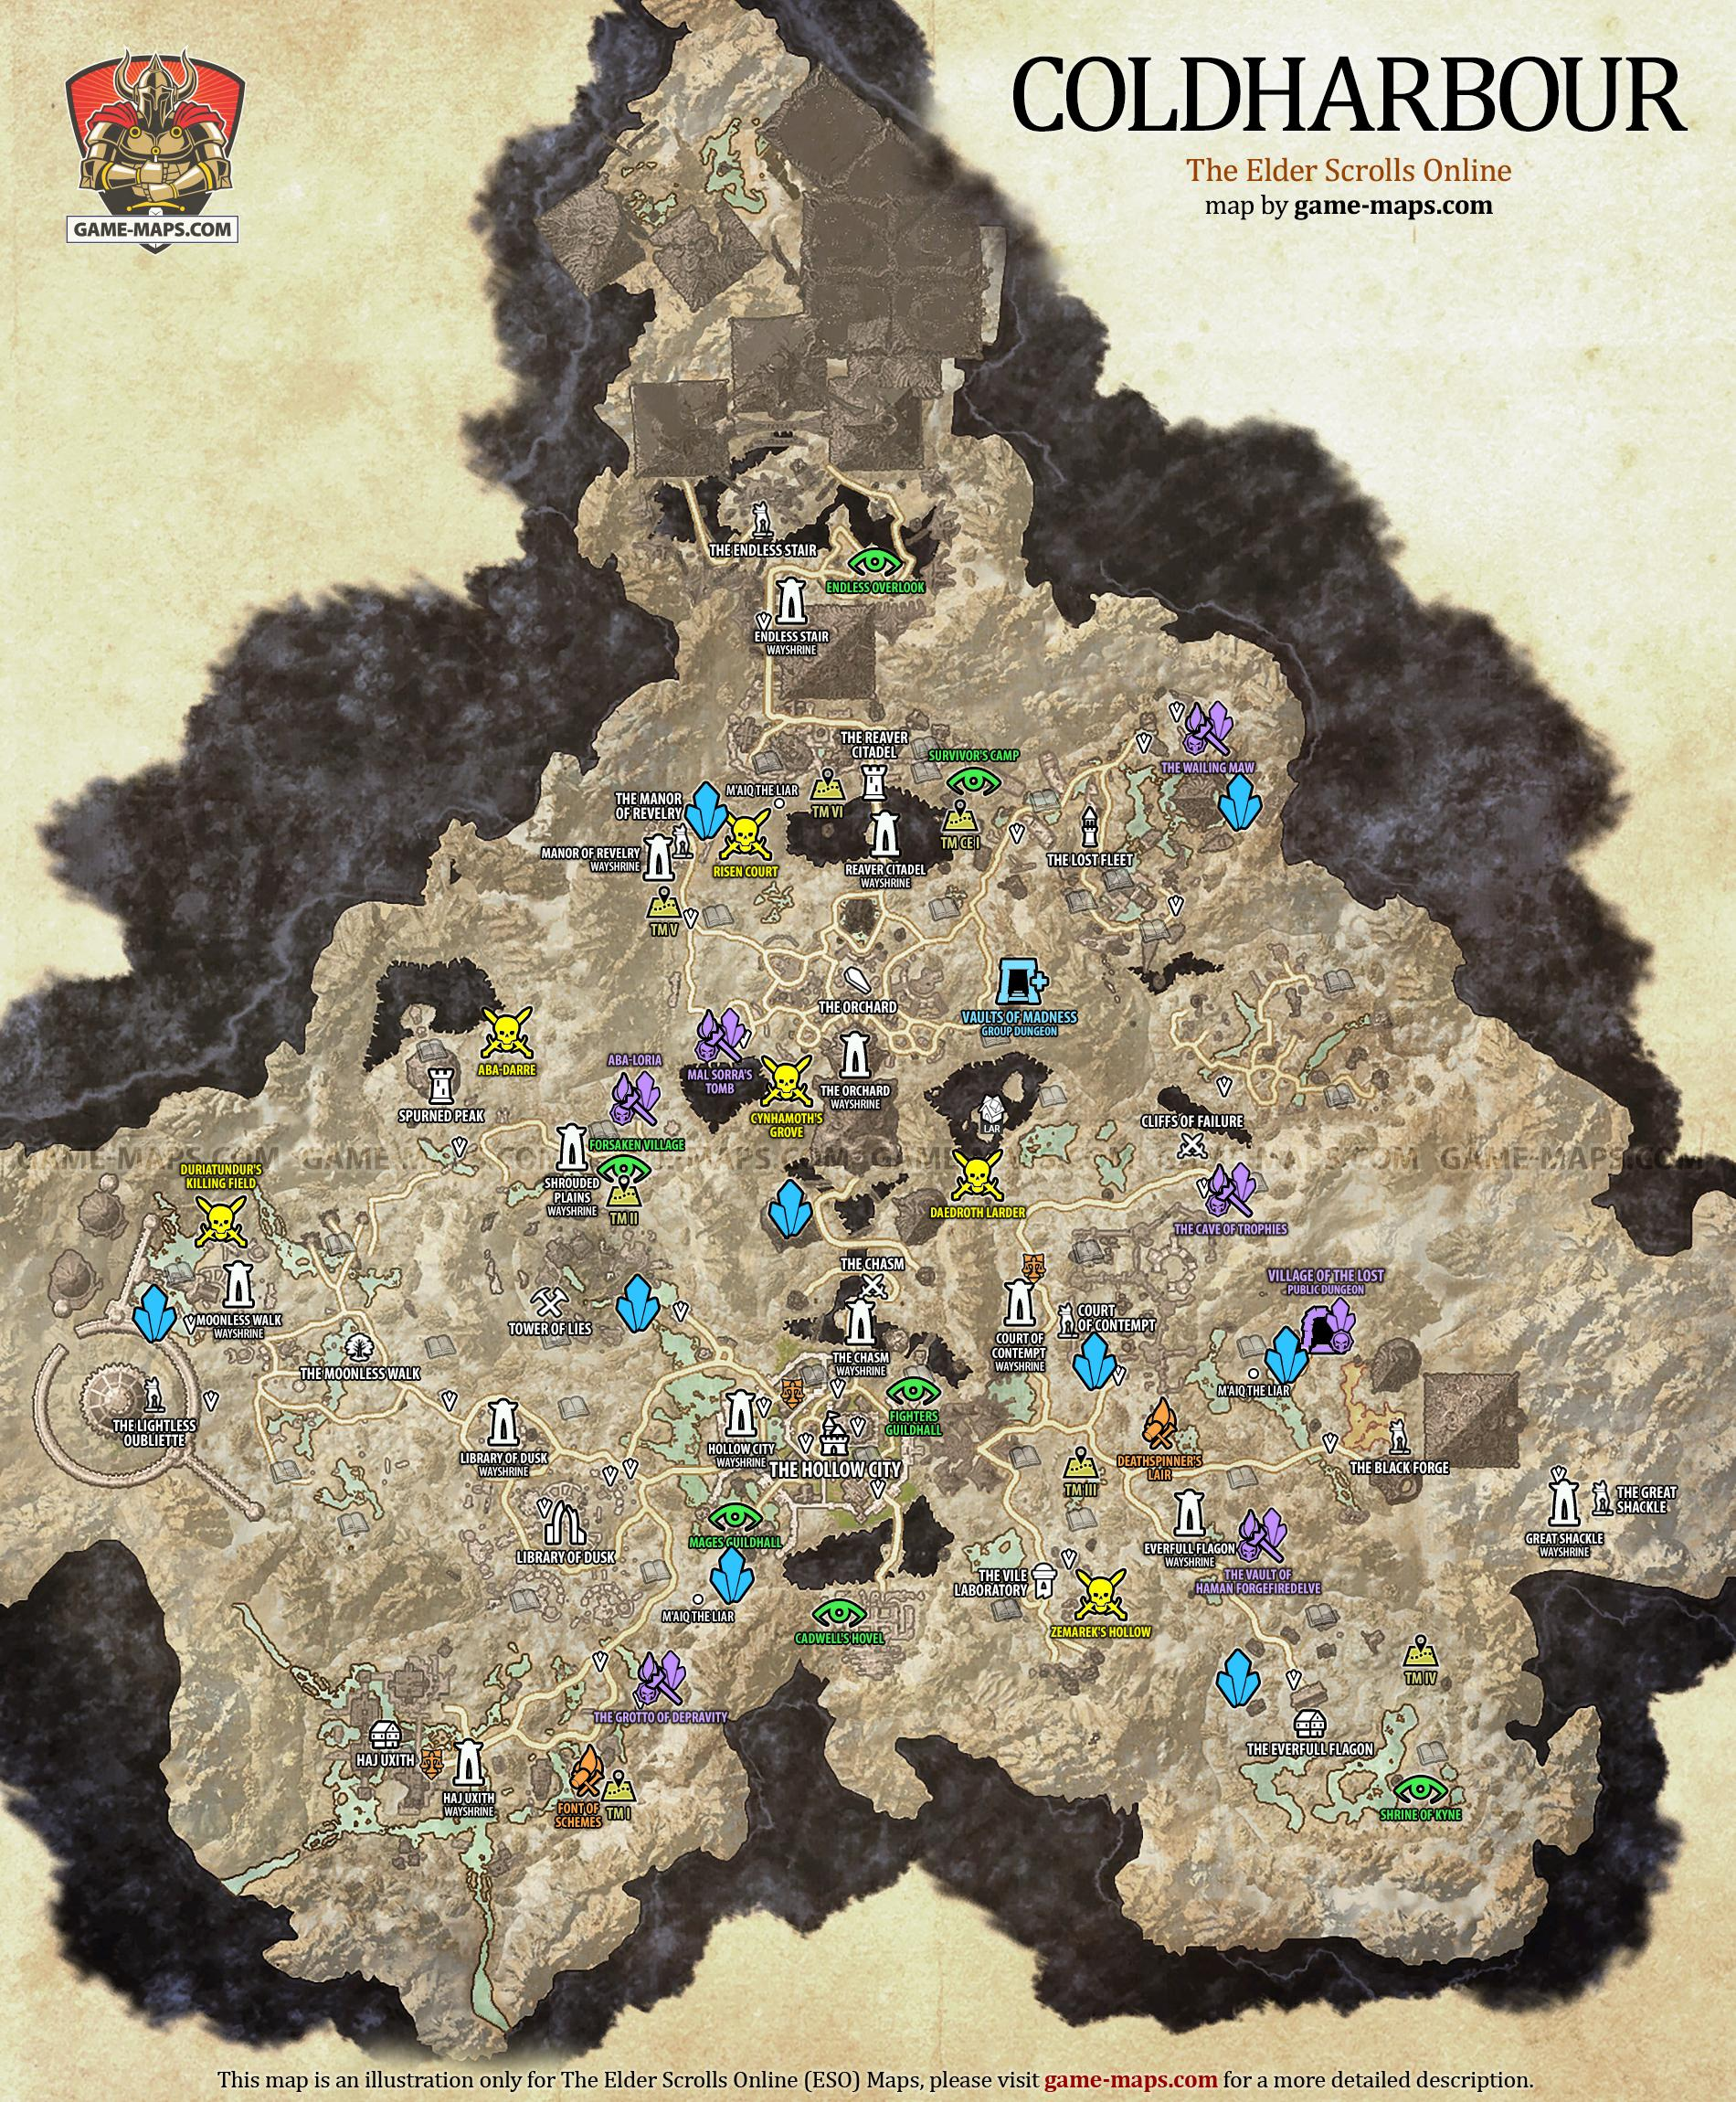 Coldharbour Map  The Elder Scrolls Online  gamemapscom